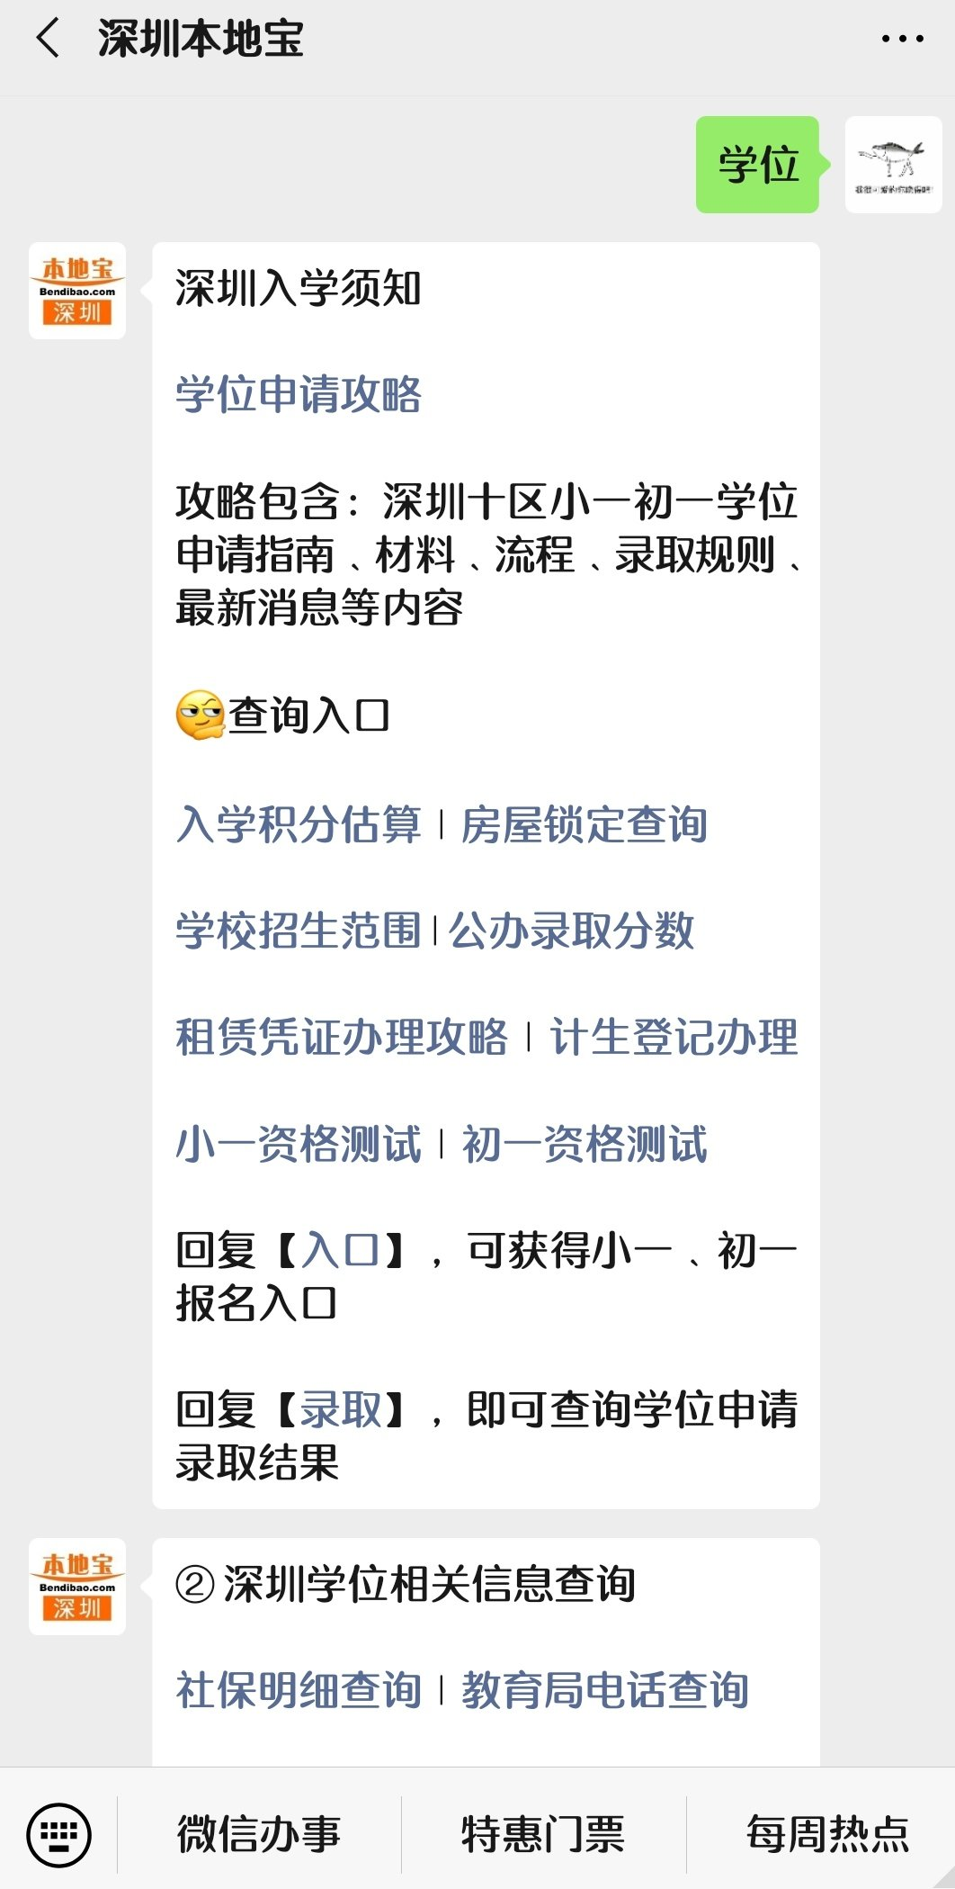 http://www.szminfu.com/shenzhenxinwen/43594.html